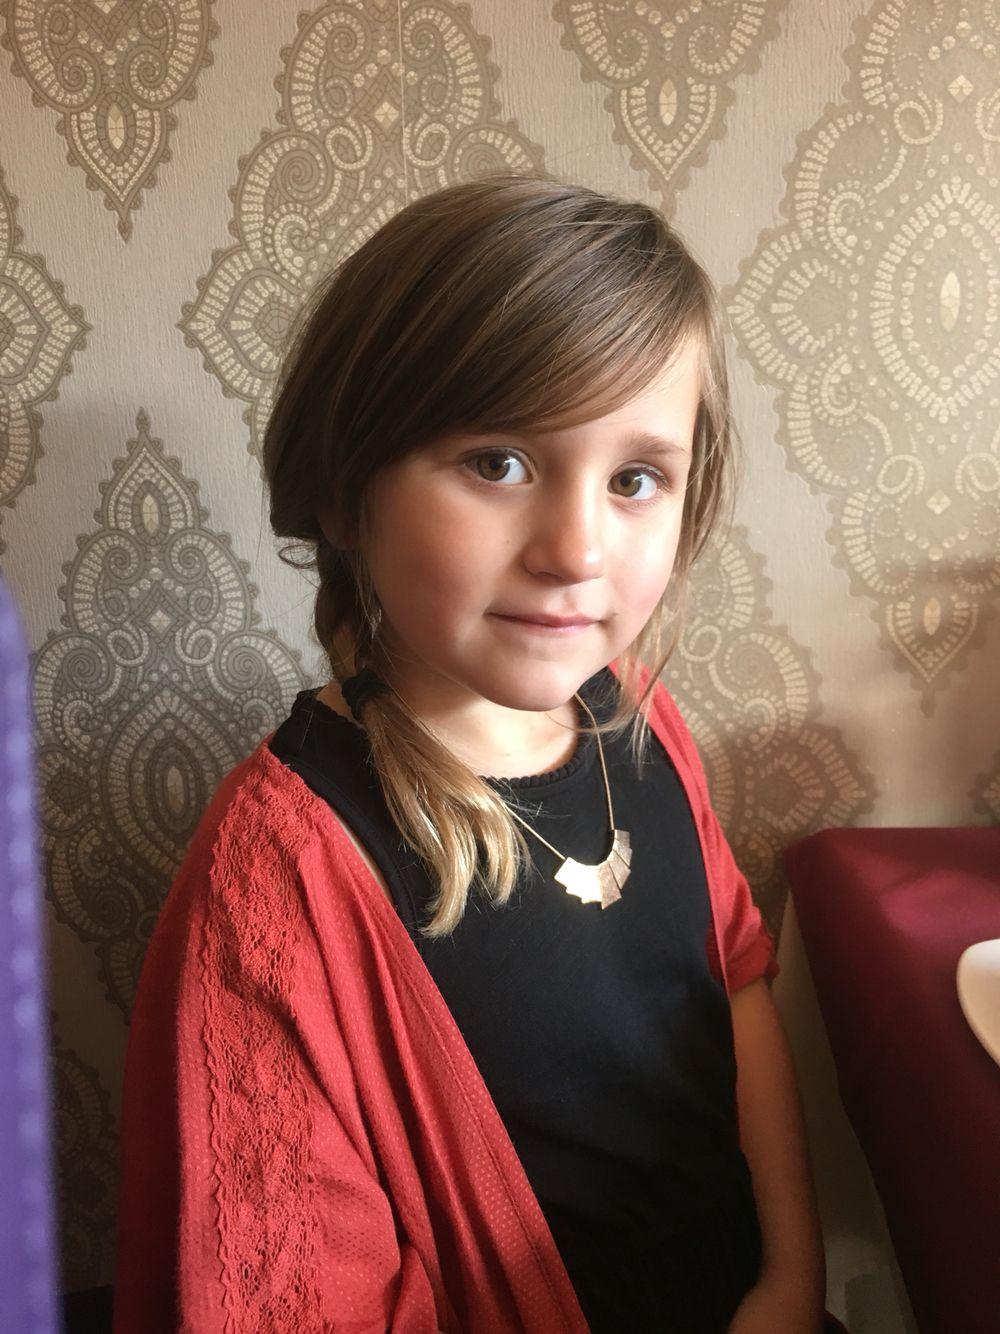 My stunning daughter